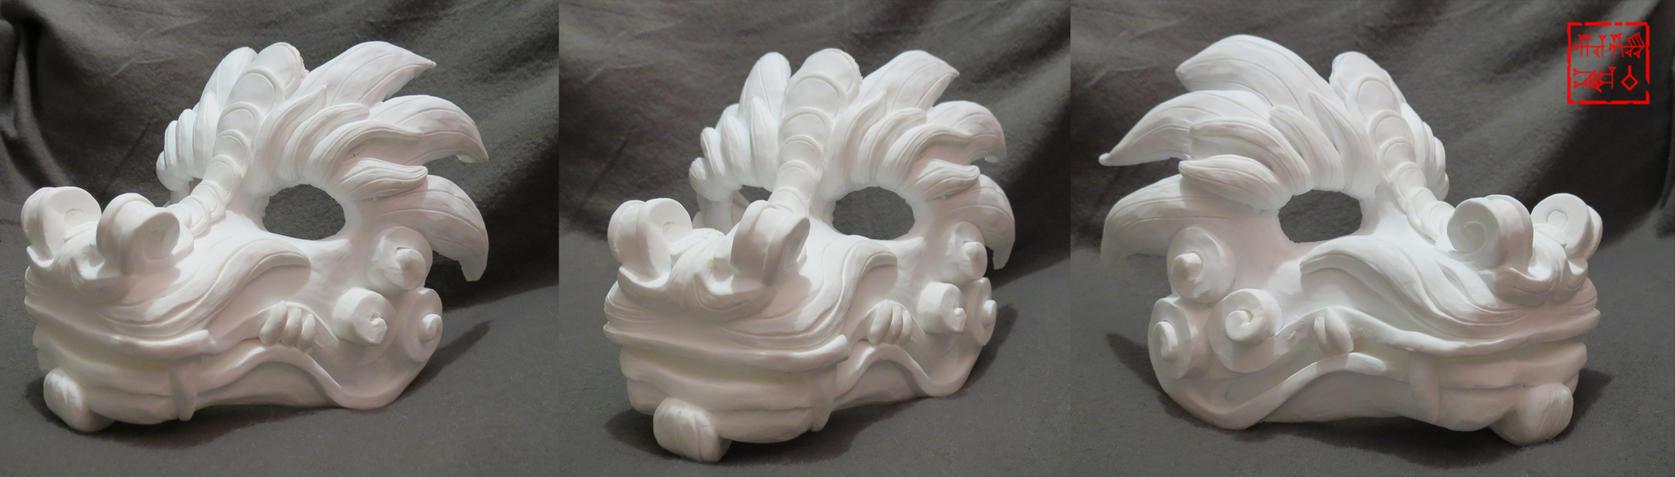 Dragon Mask First Cast by Coeurlregina